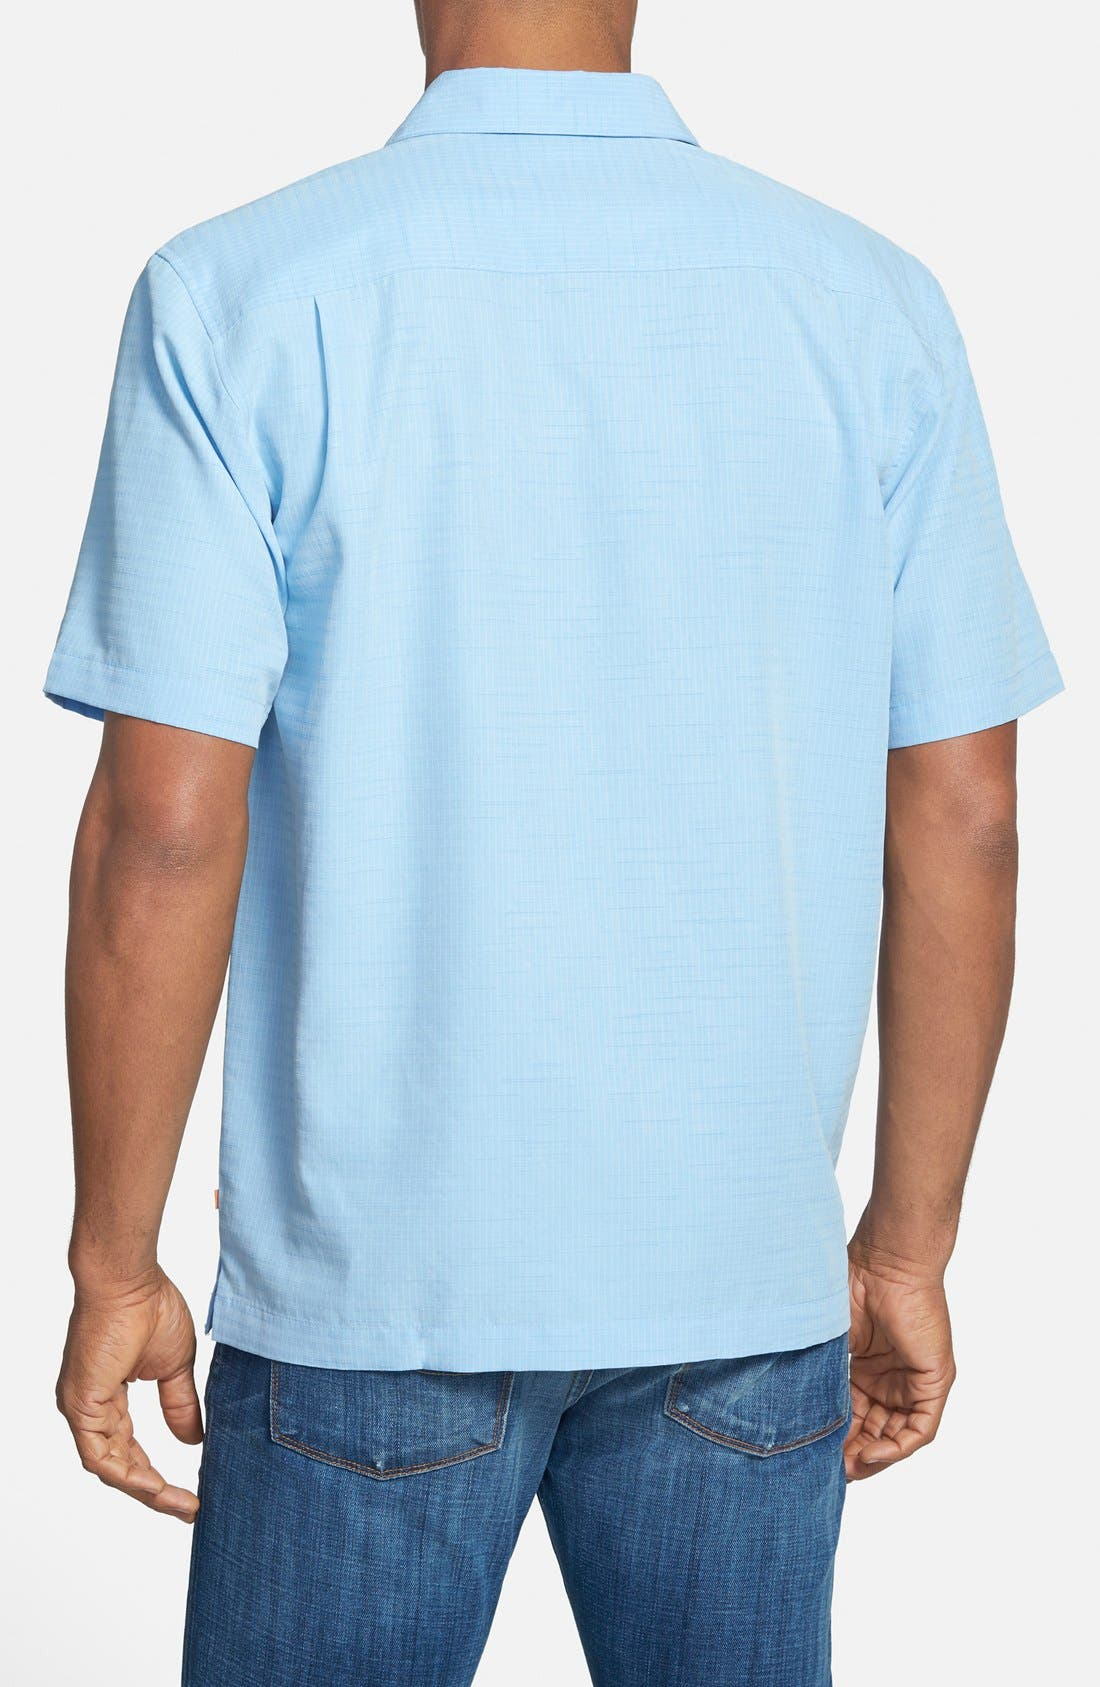 'Centinela 4' Short Sleeve Sport Shirt,                             Alternate thumbnail 2, color,                             Azure